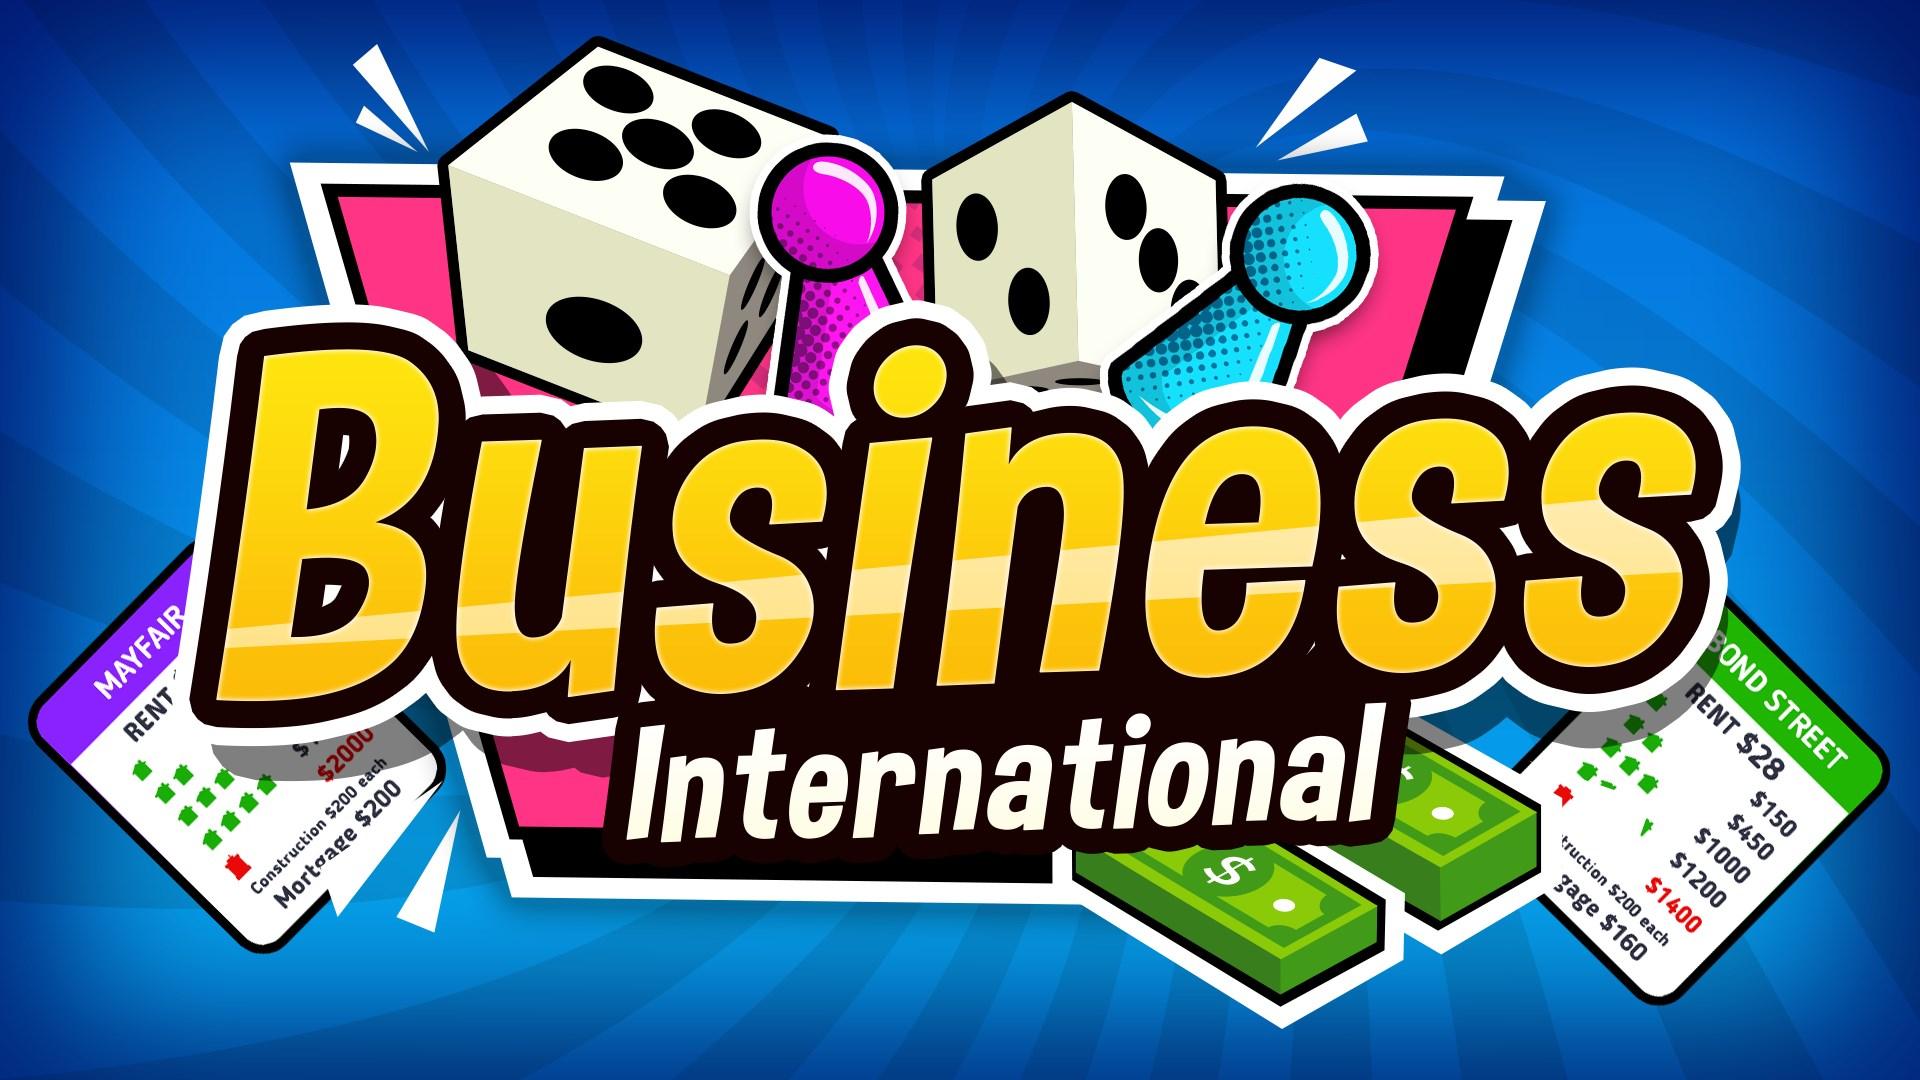 c7d6a5639 BUSINESS INTERNATIONAL'ga ega bo'ling - Microsoft Store uz-Latn-UZ